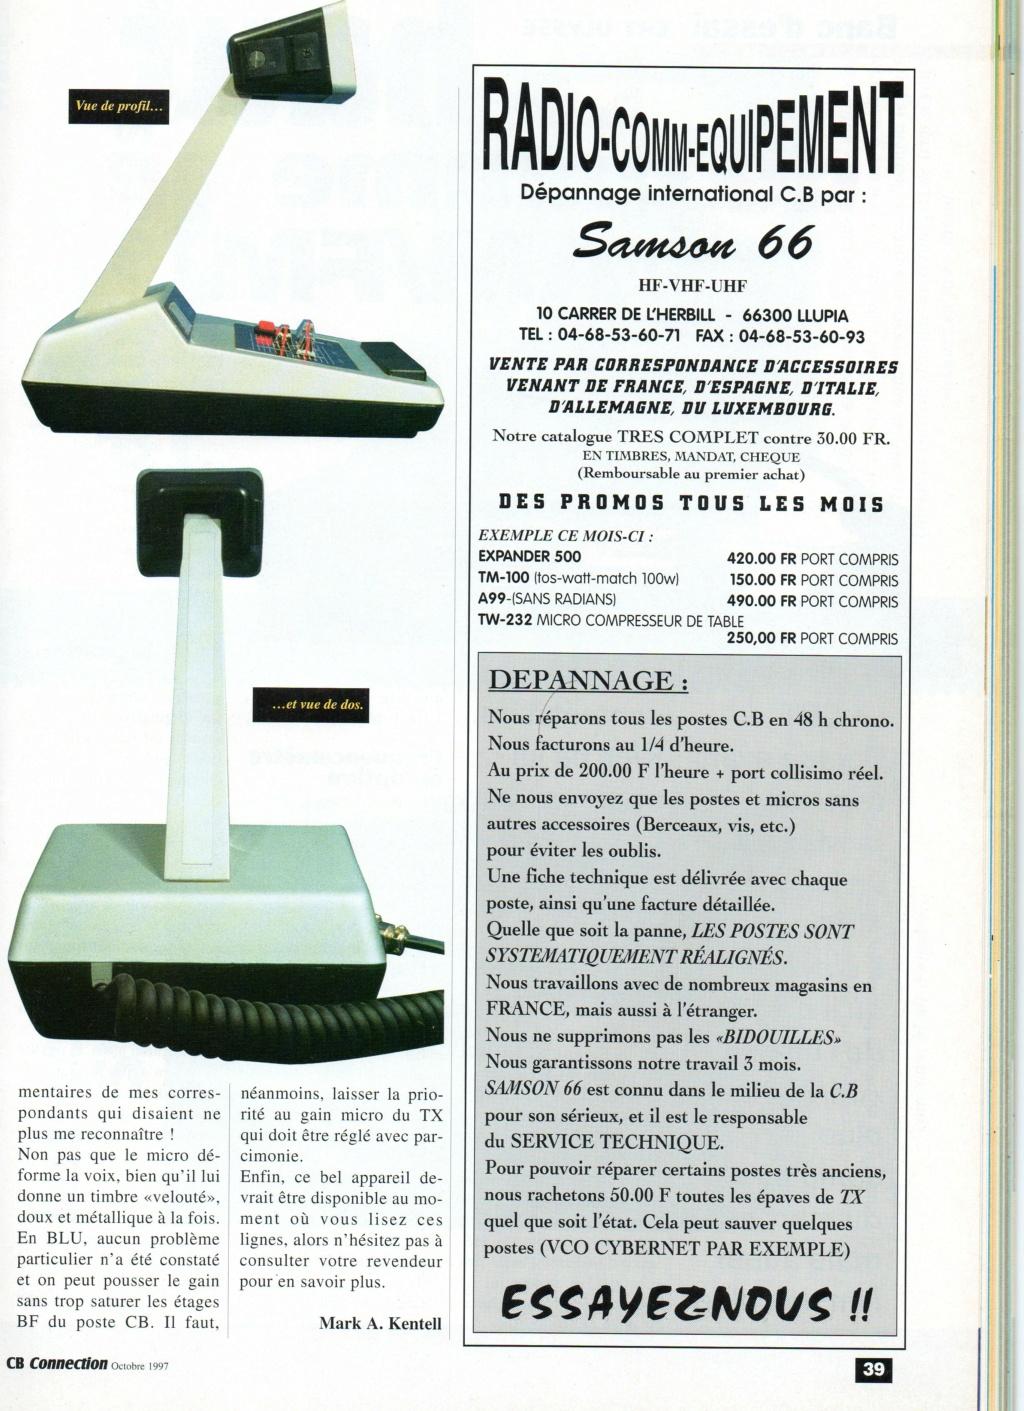 EuroCB - Turner Expander 500 (Micro de table) Chora586